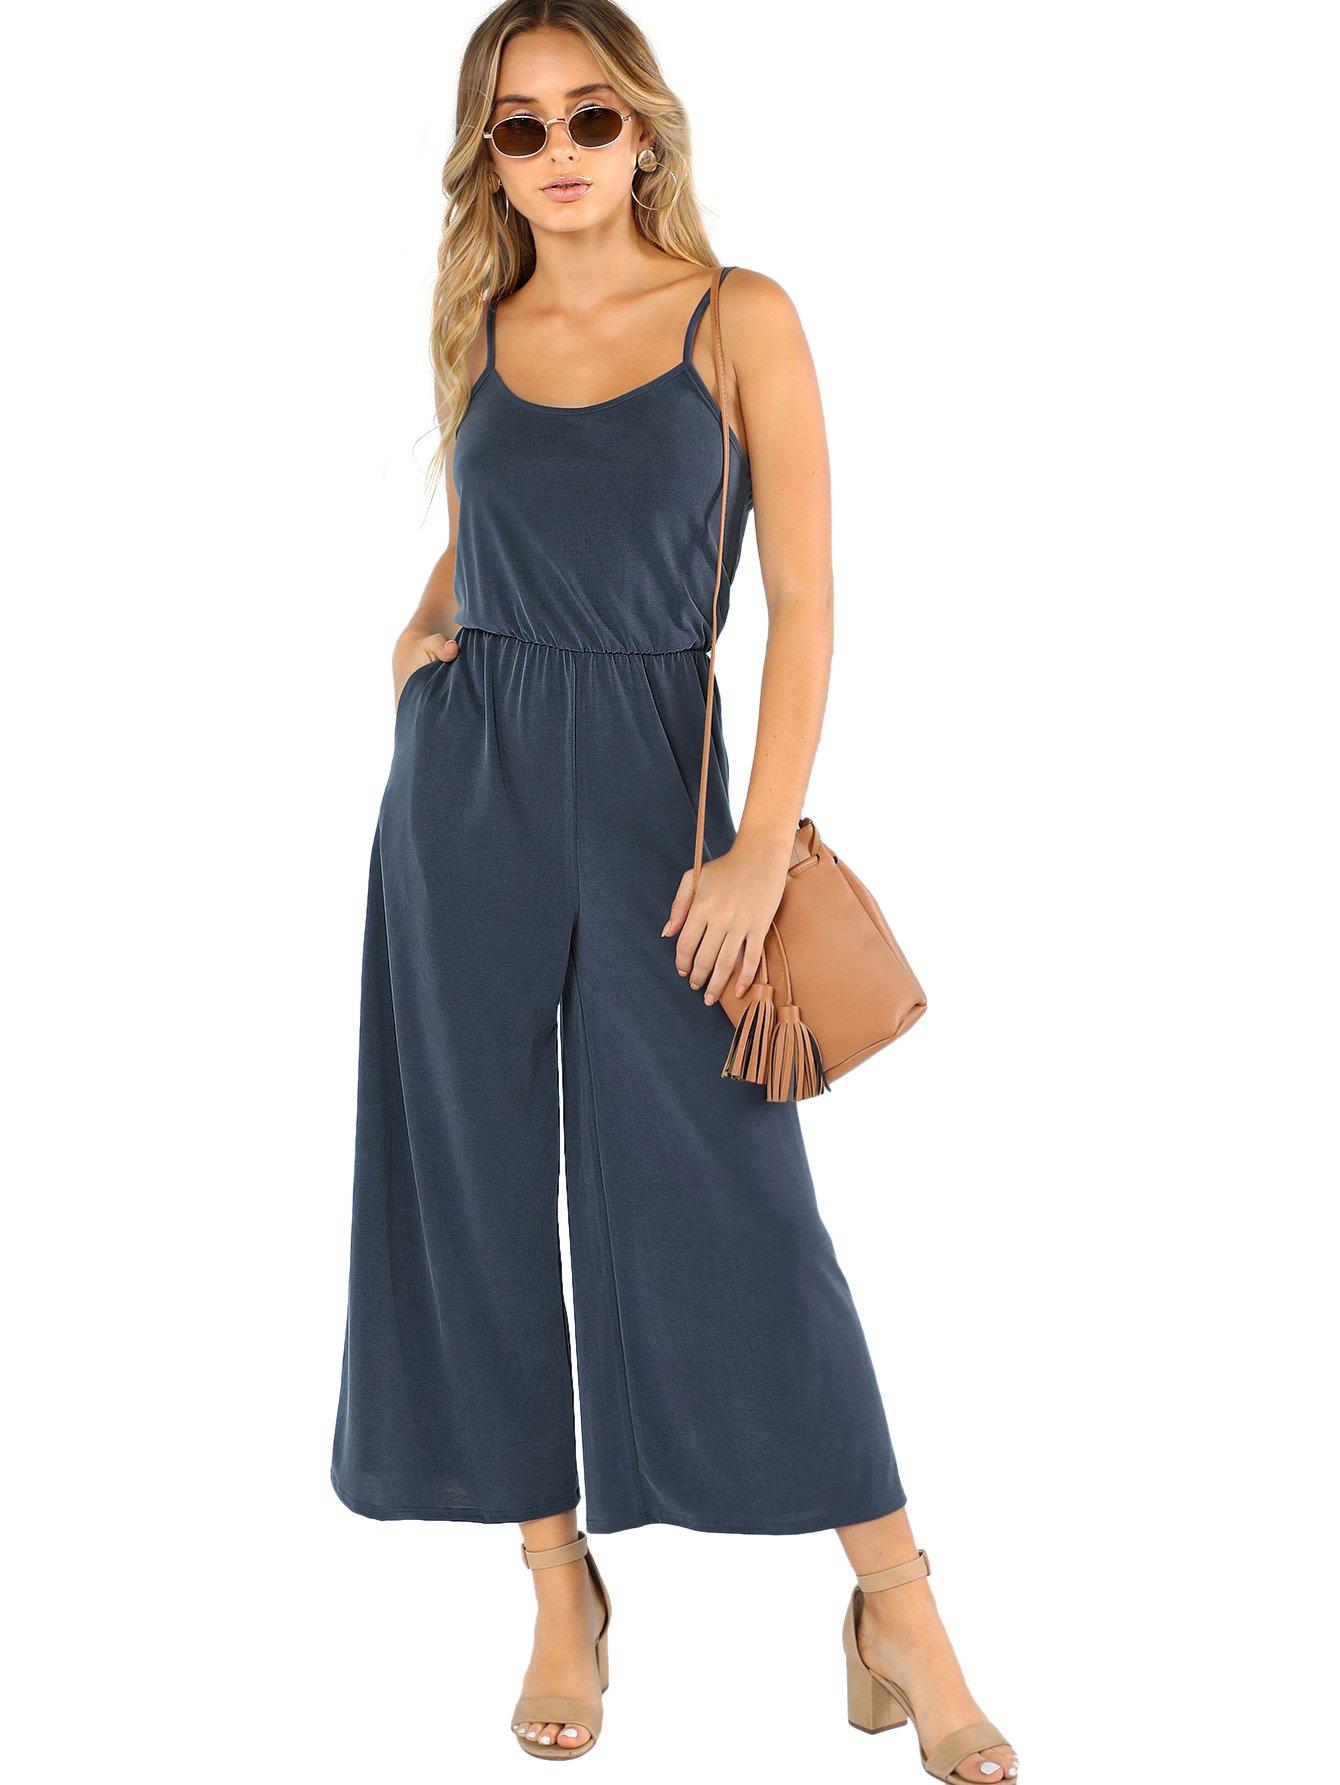 DIDK Women's Spaghetti Strap Flare Wide Leg Cami Culottes Jumpsuits